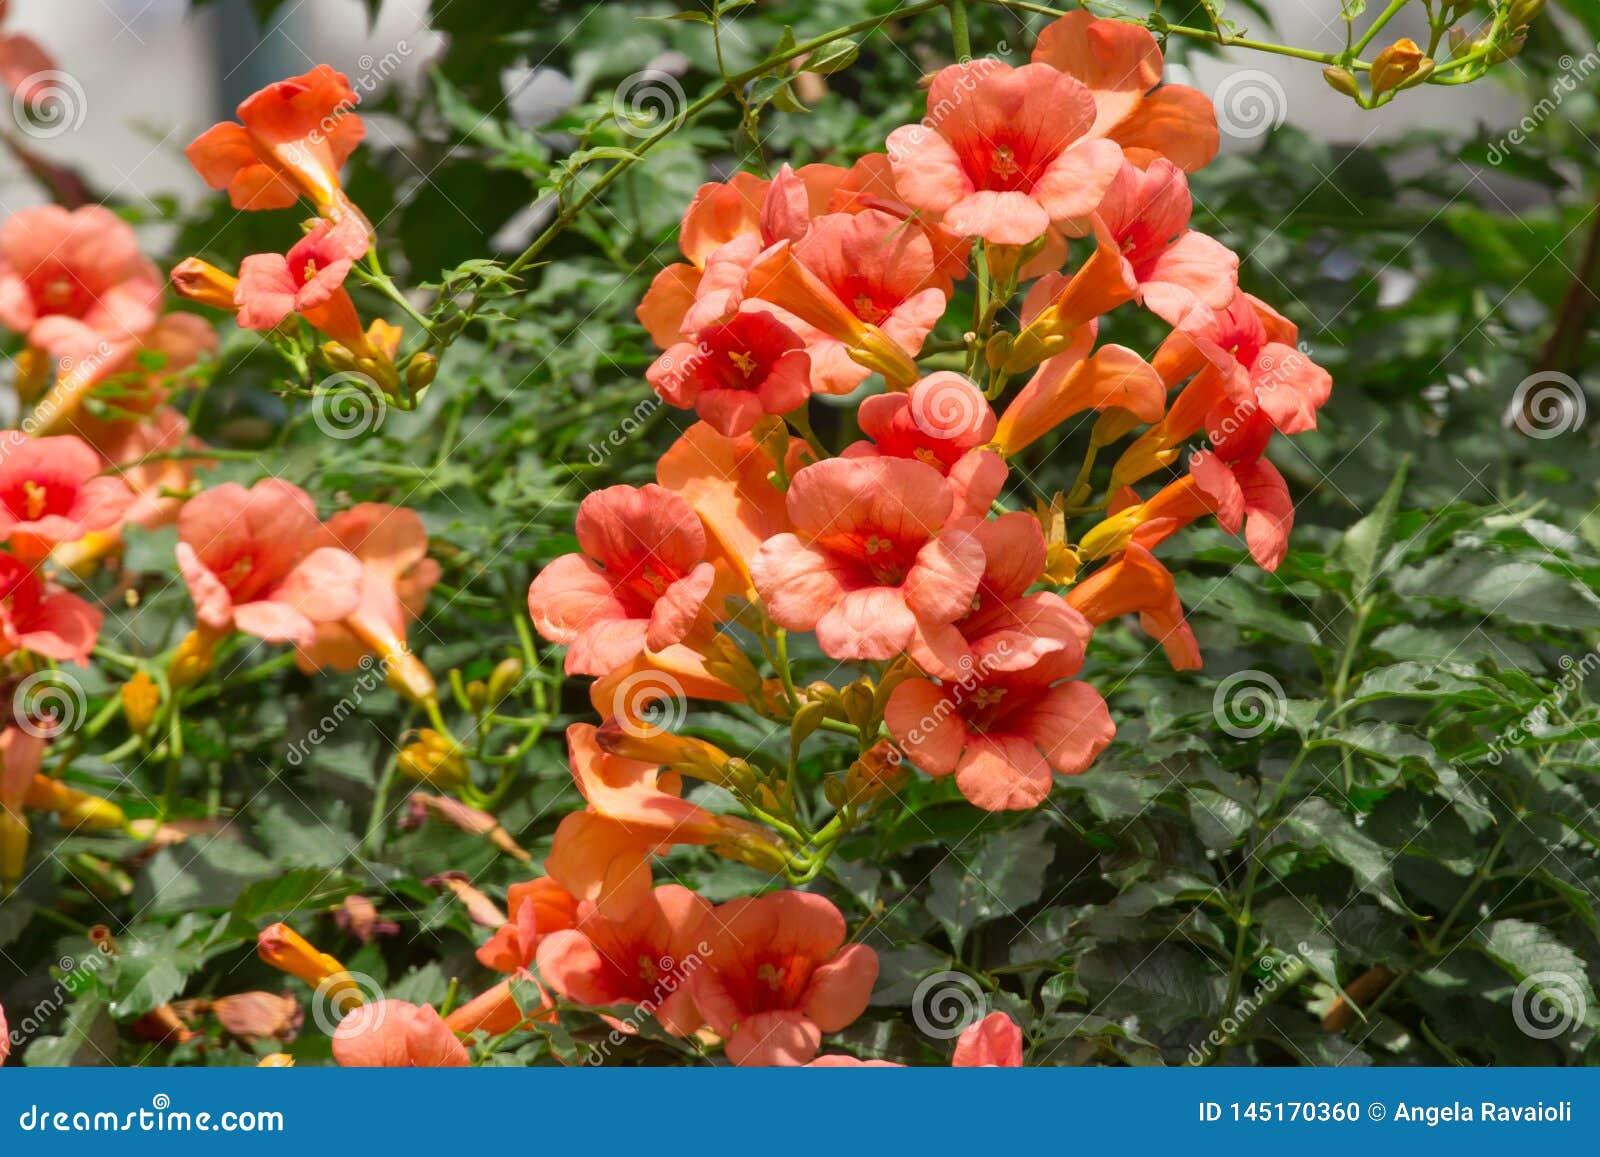 Wild Bignonia Plant Flower